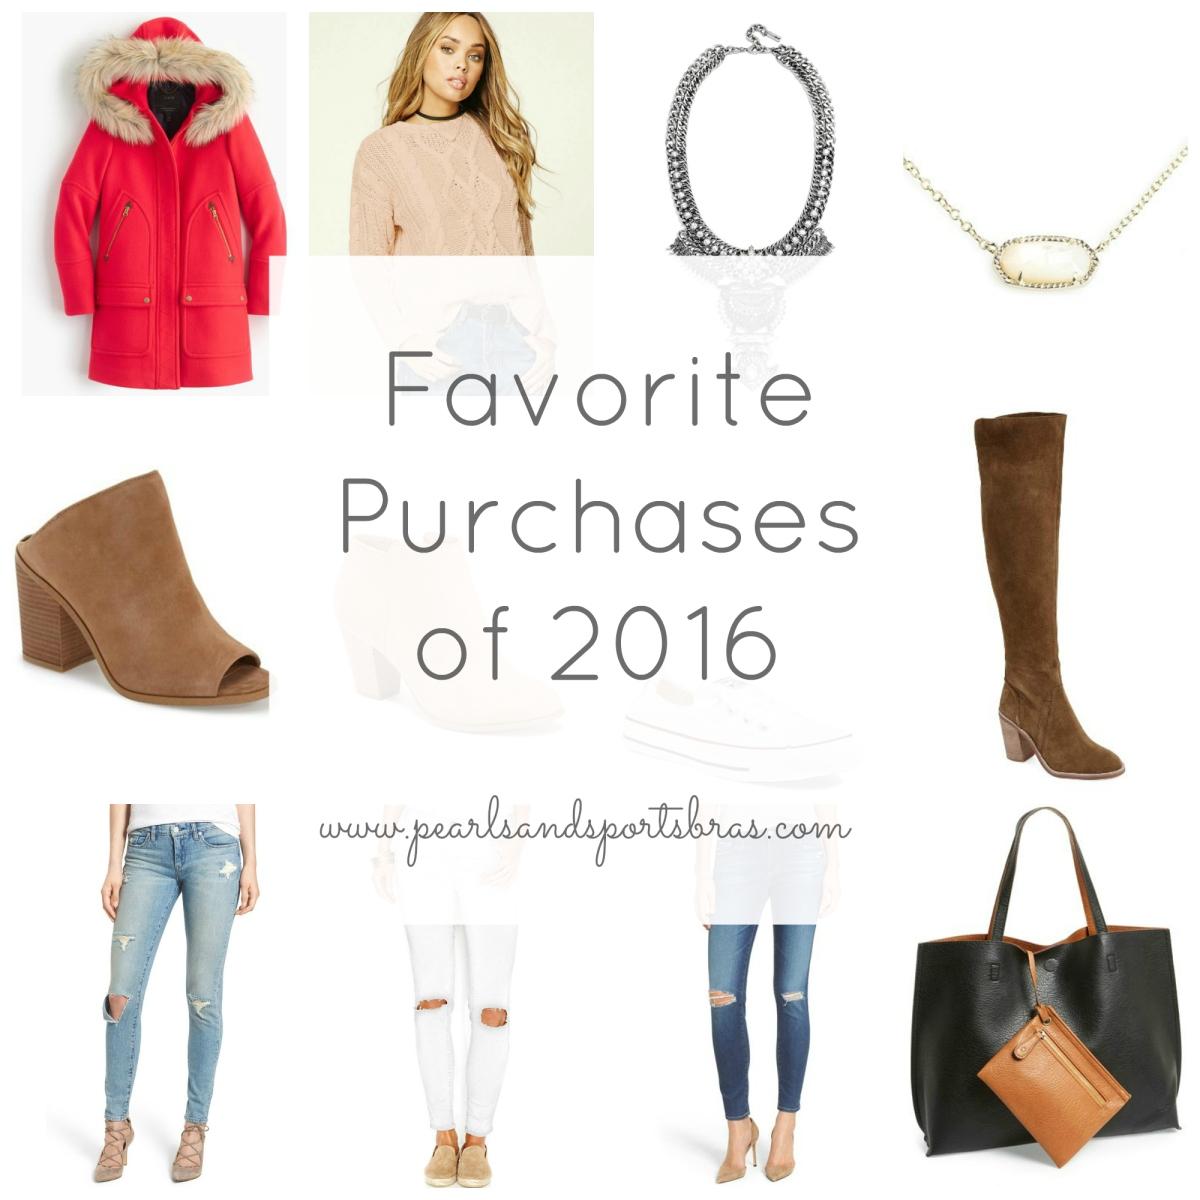 Favorite Purchases of 2016  www.pearlsandsportsbras.com 